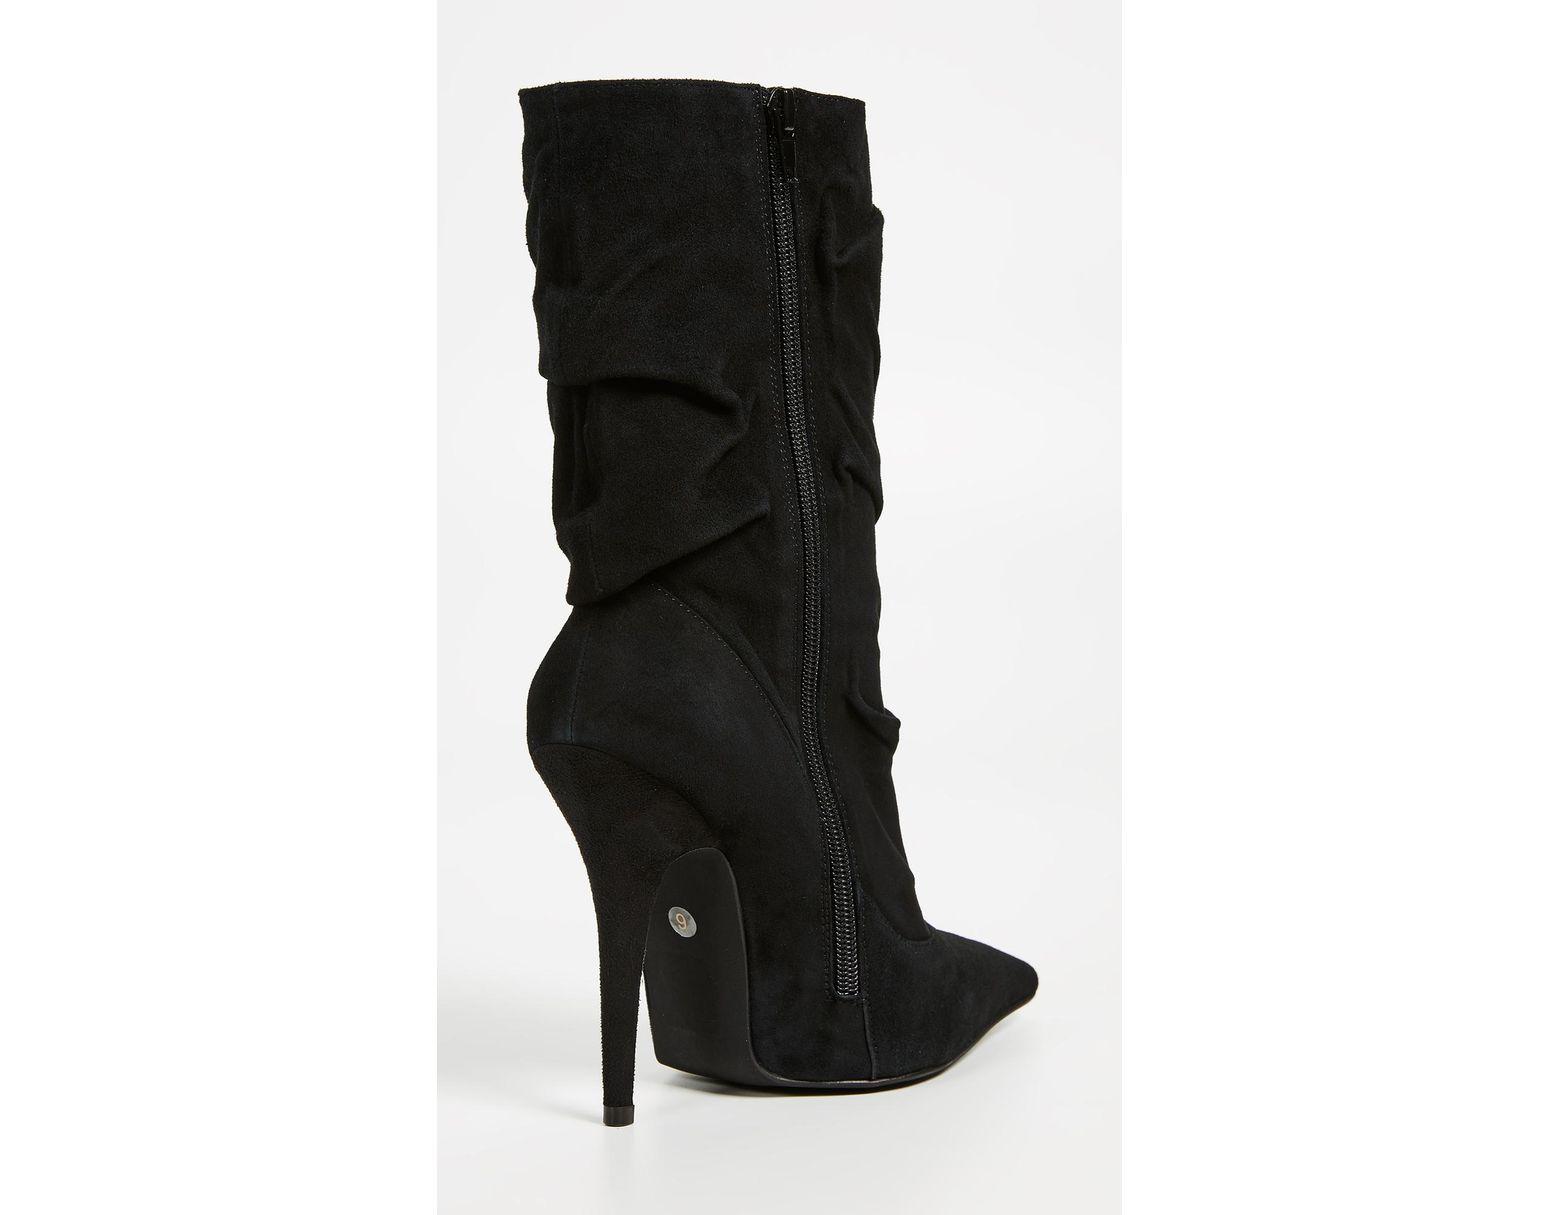 e3d522c637a Women's Black Erotic Mid Shaft Boots